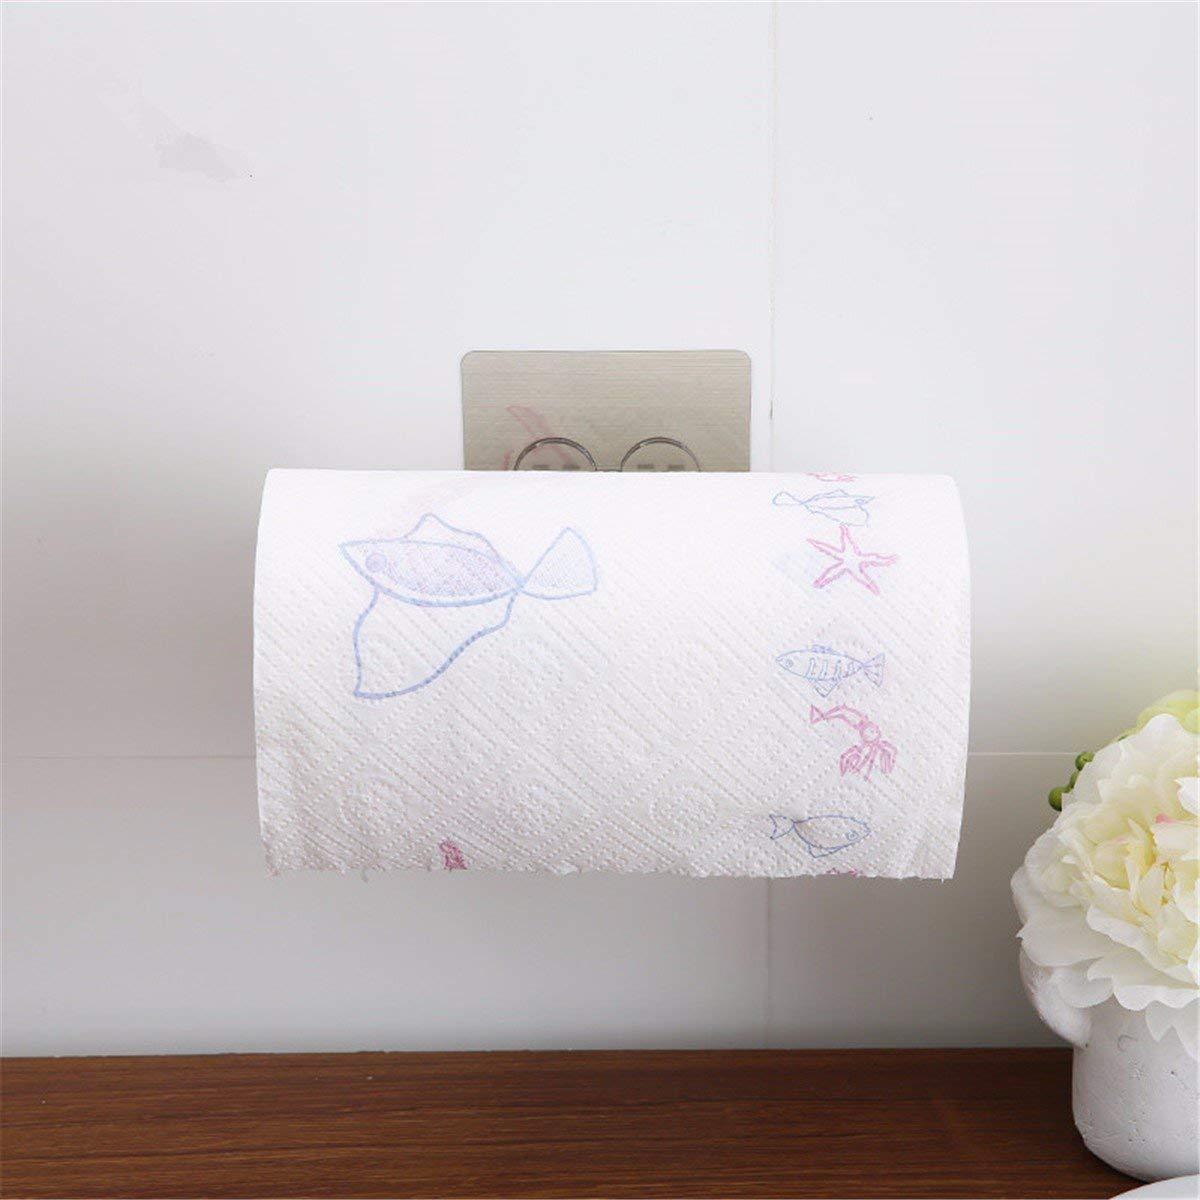 ZHAS Paper towel rack drawer paper towel rackRack kitchen towel rack bathroom towel rack Toilet Paper Holders